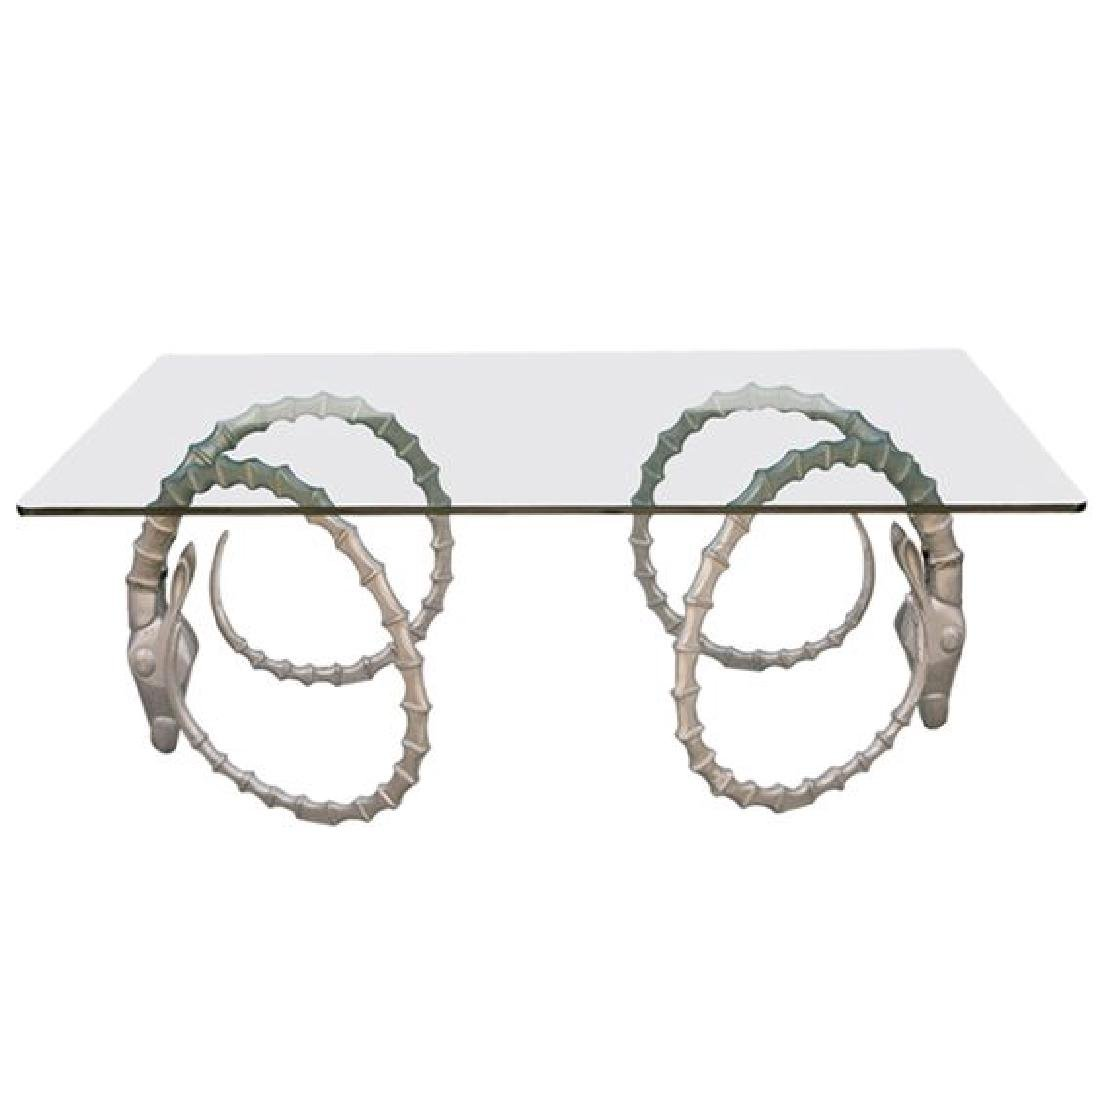 IBEX HEAD COFFEE TABLE